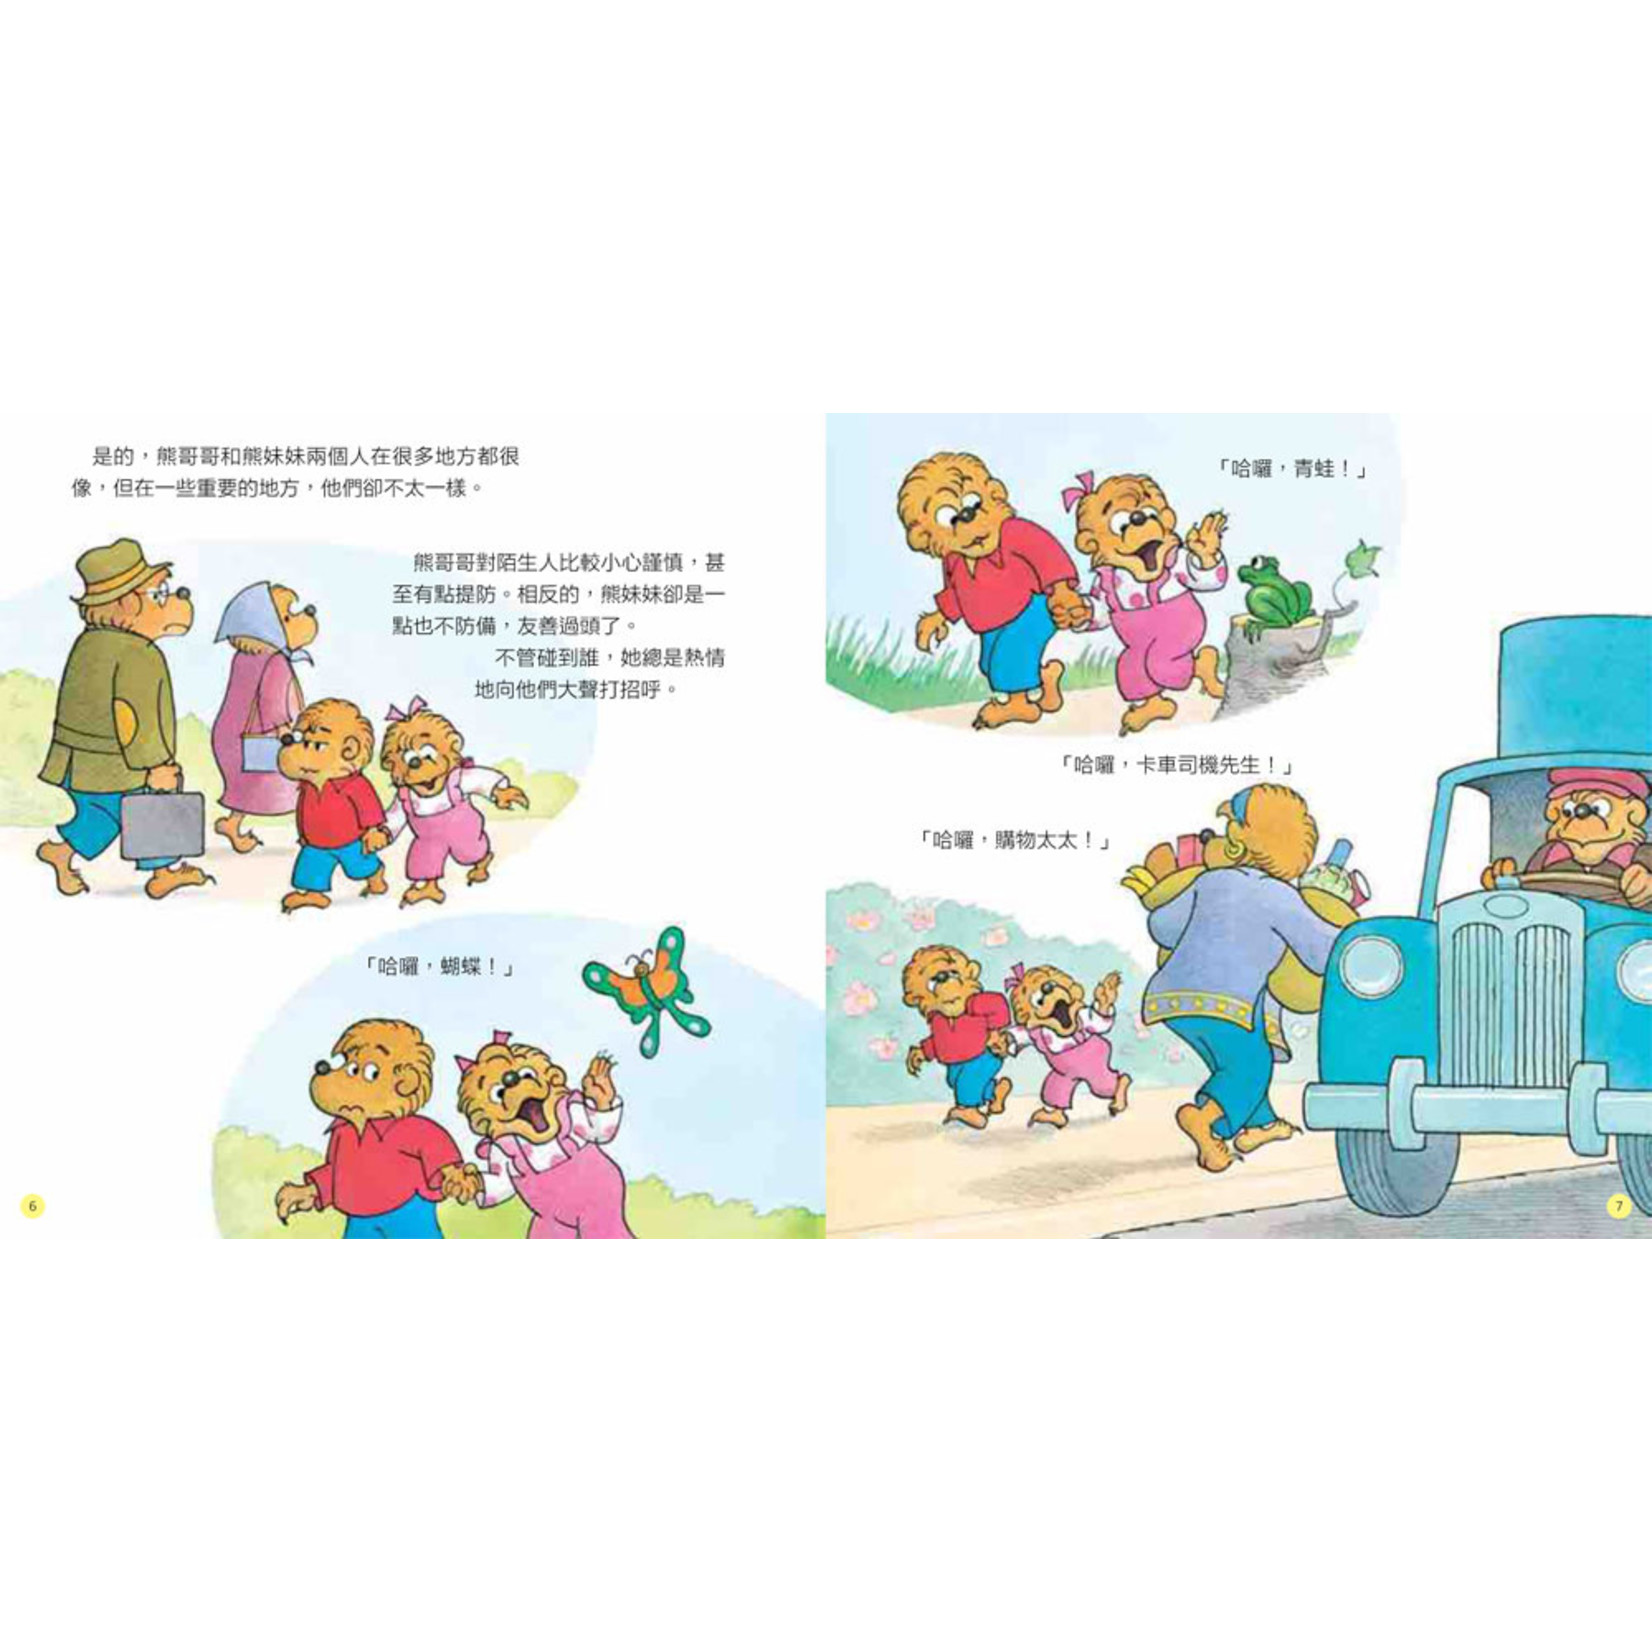 生命樹 Life Tree Global 貝安斯坦熊系列02:怎樣面對陌生人 The Berenstain Bears Learn about Strangers